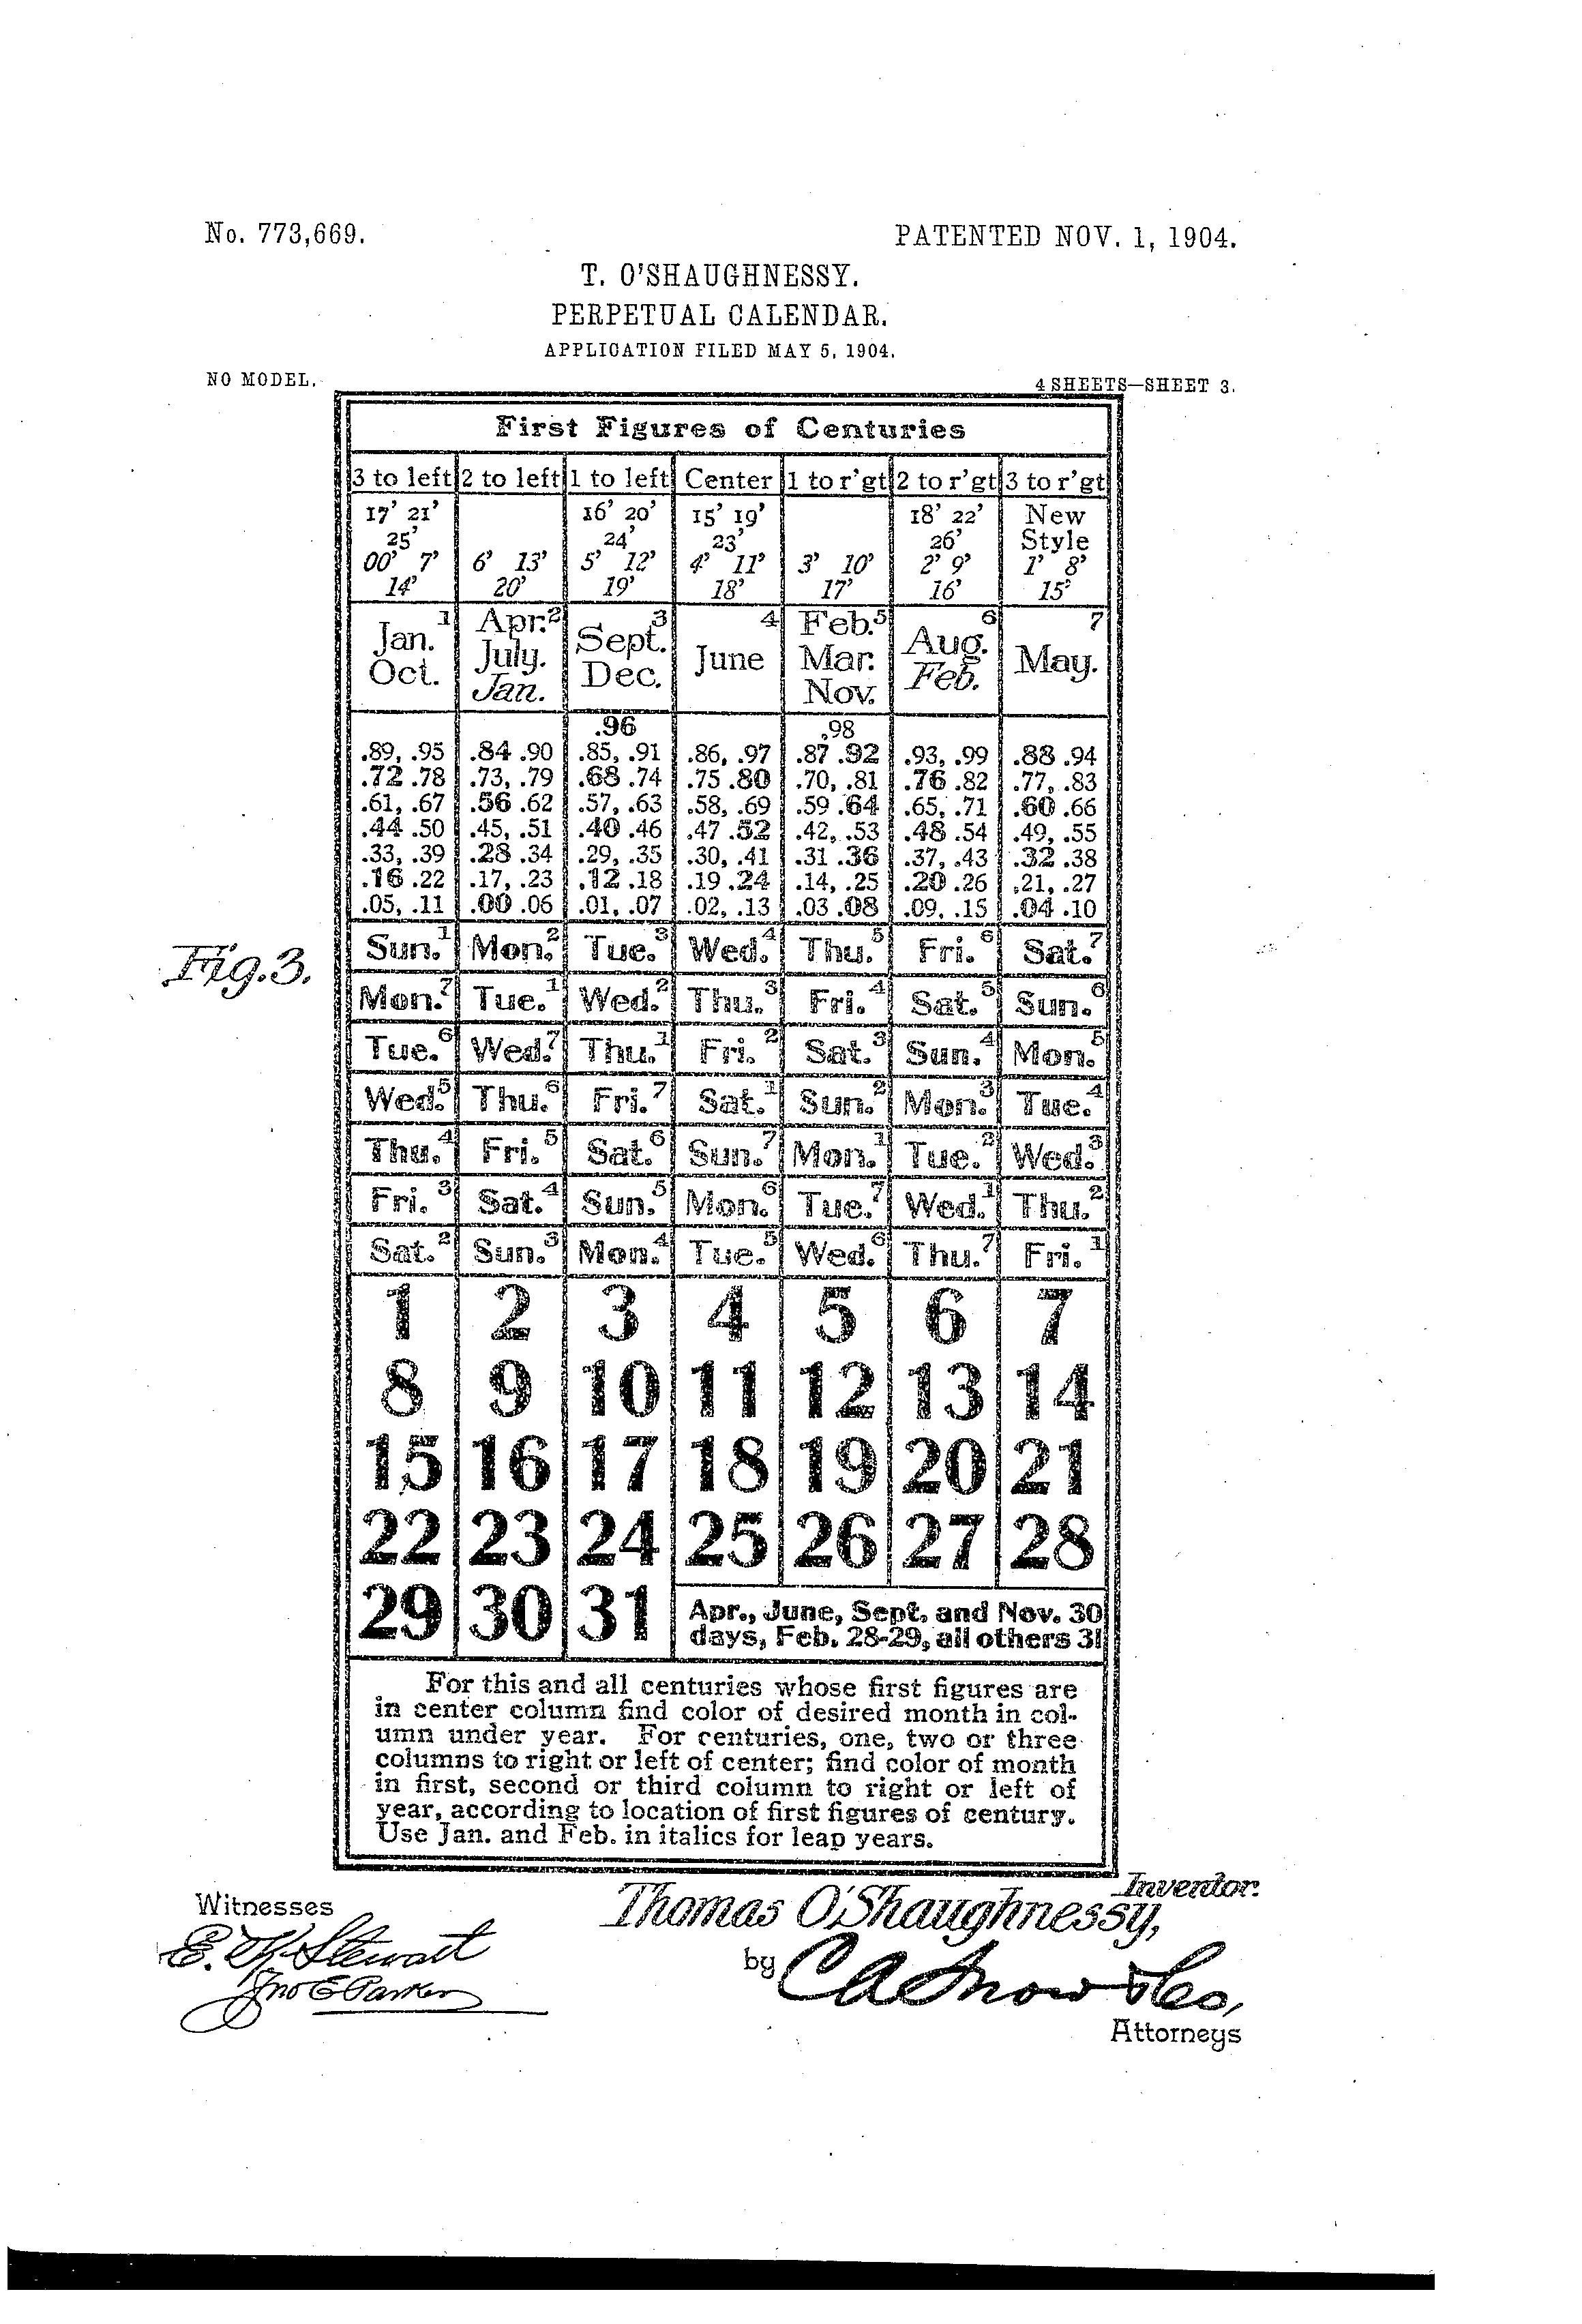 Julian Calendar Perpetual - Viewing Gallery